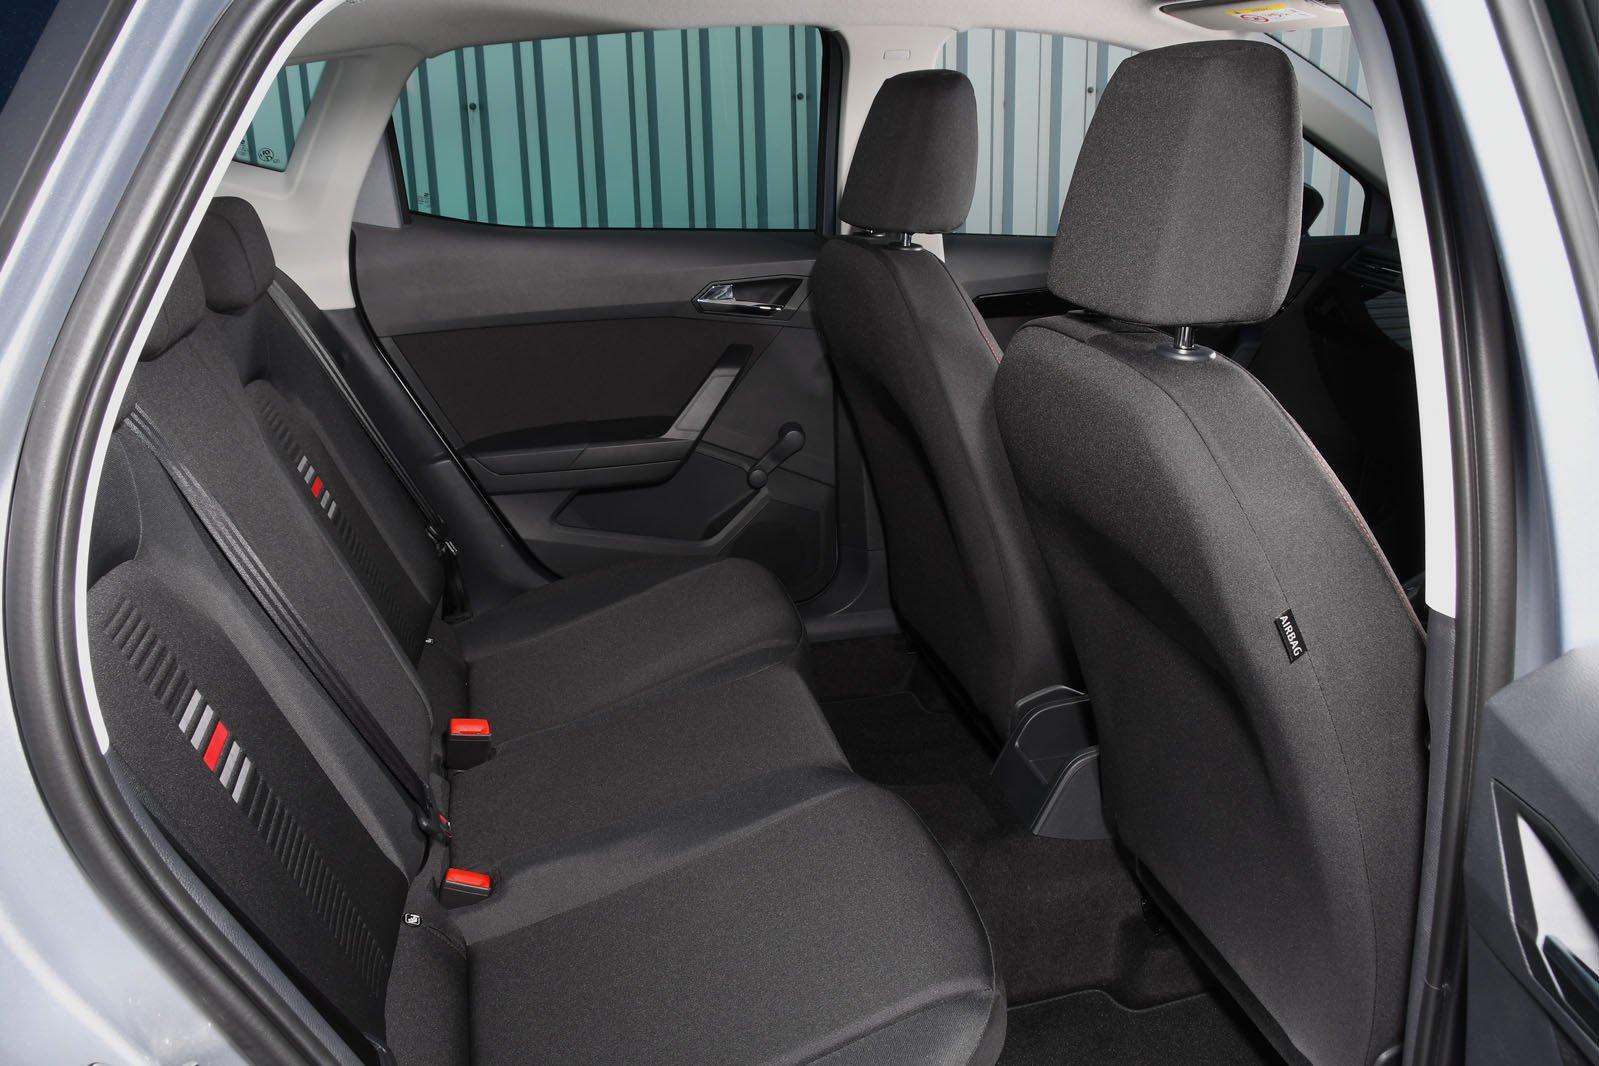 Seat Ibiza 2018 RHD rear seats